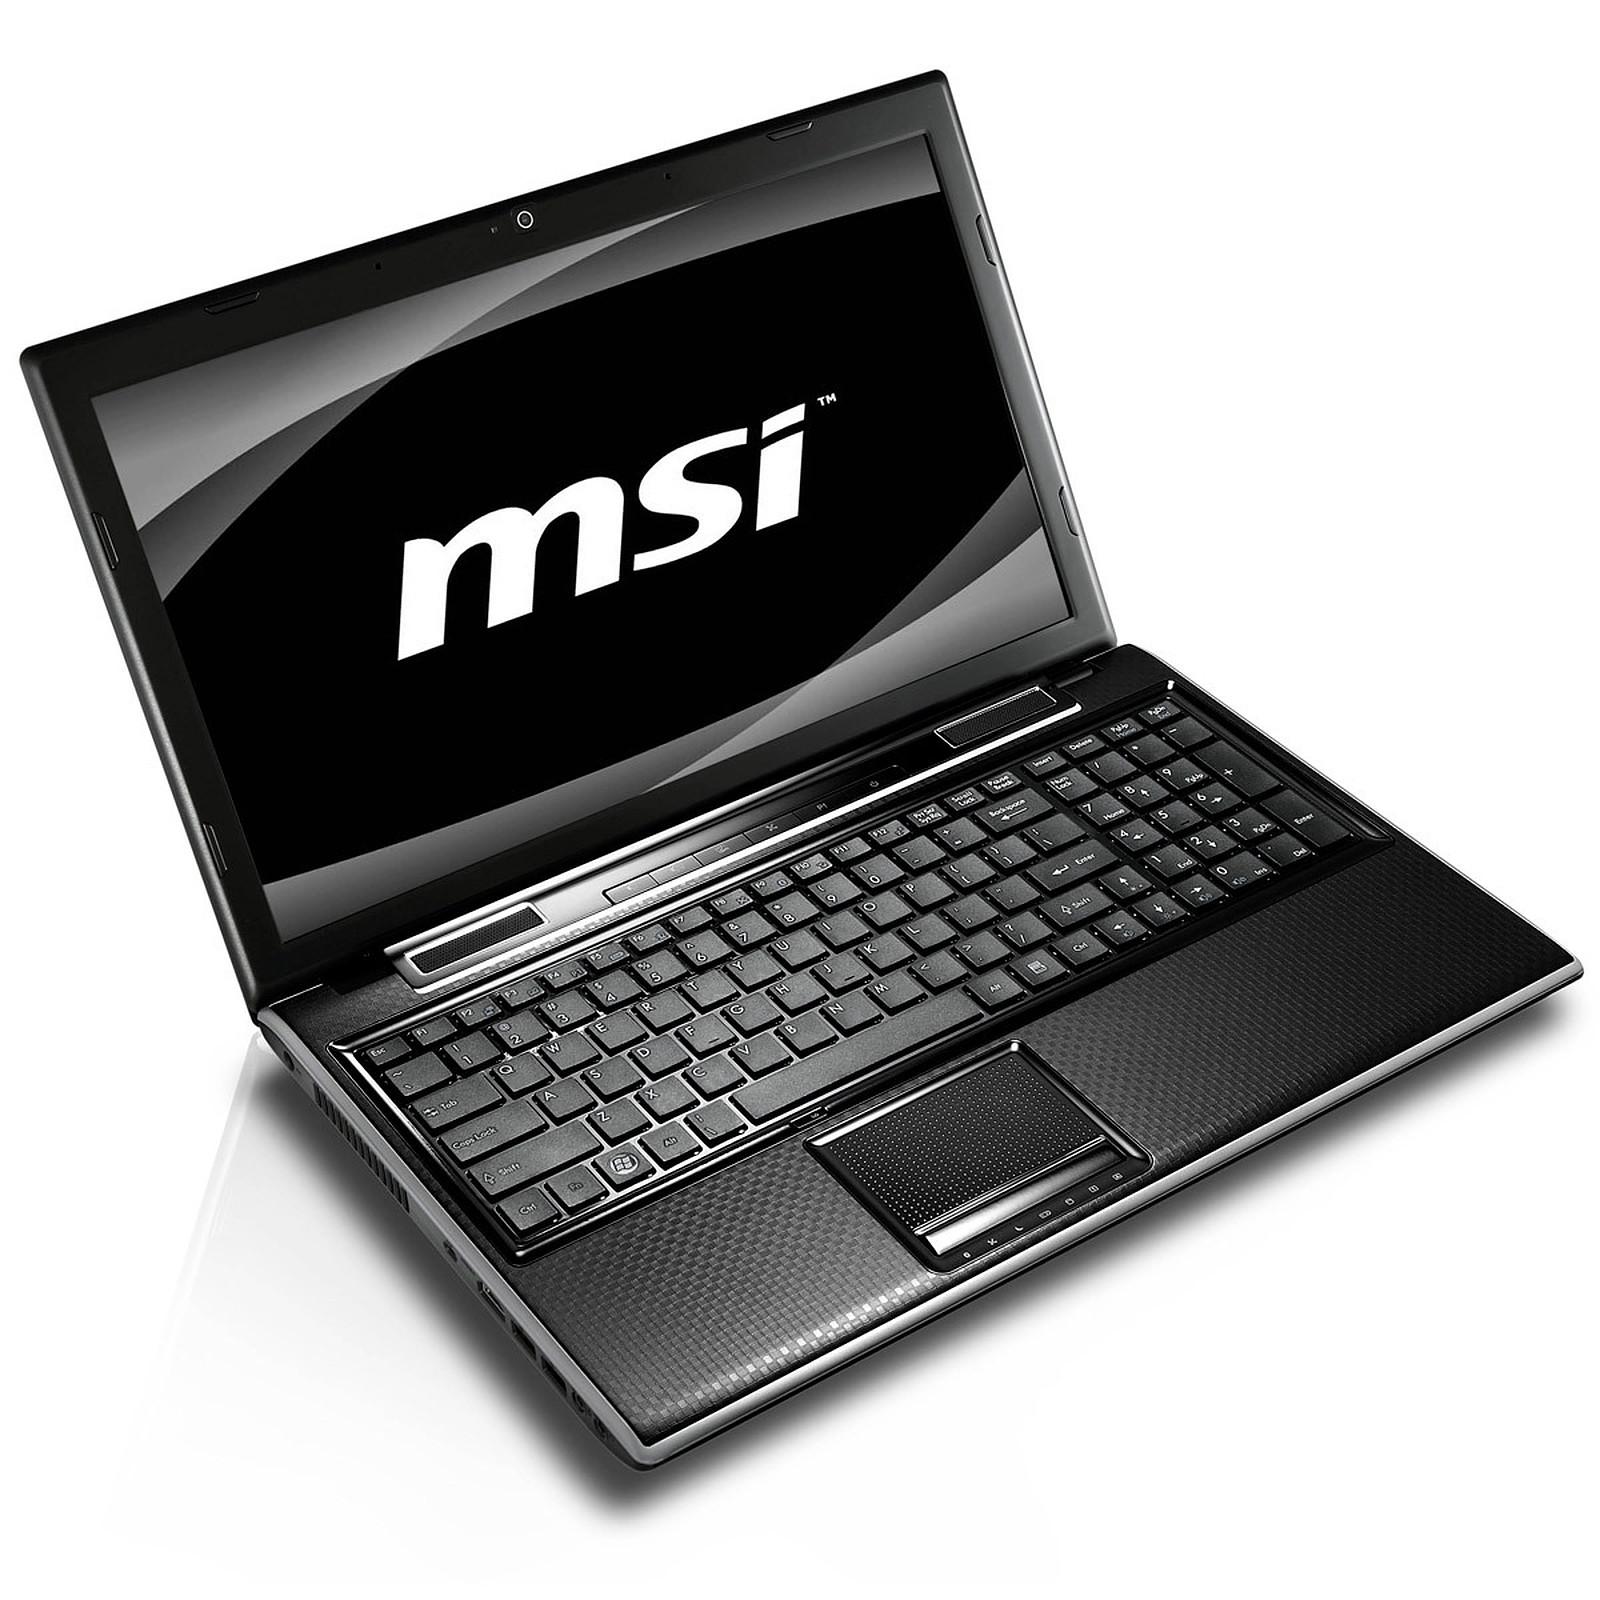 MSI FX600-062